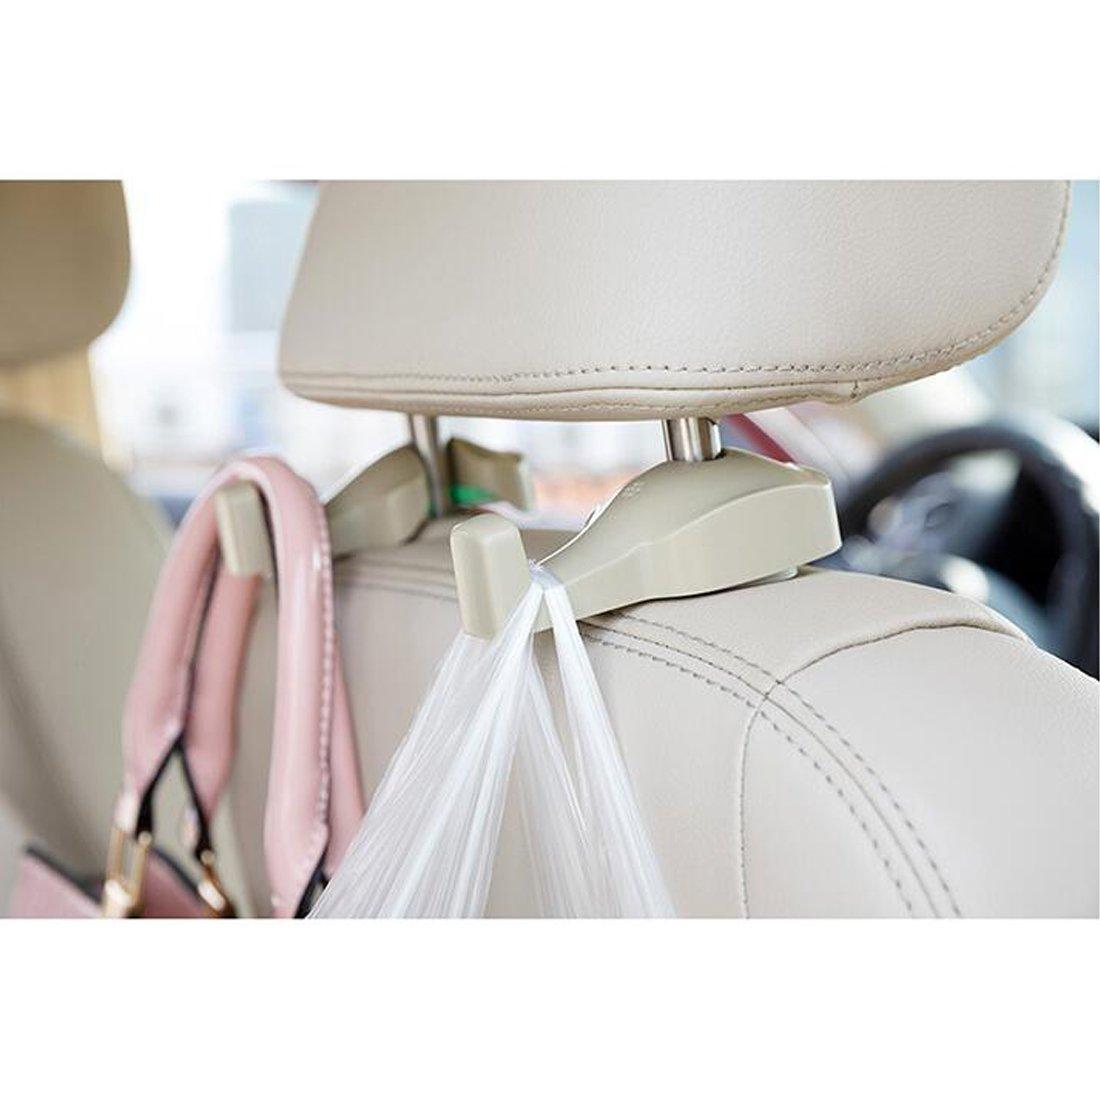 Amazon.com: Spotest ganchos para reposacabezas de auto, par ...